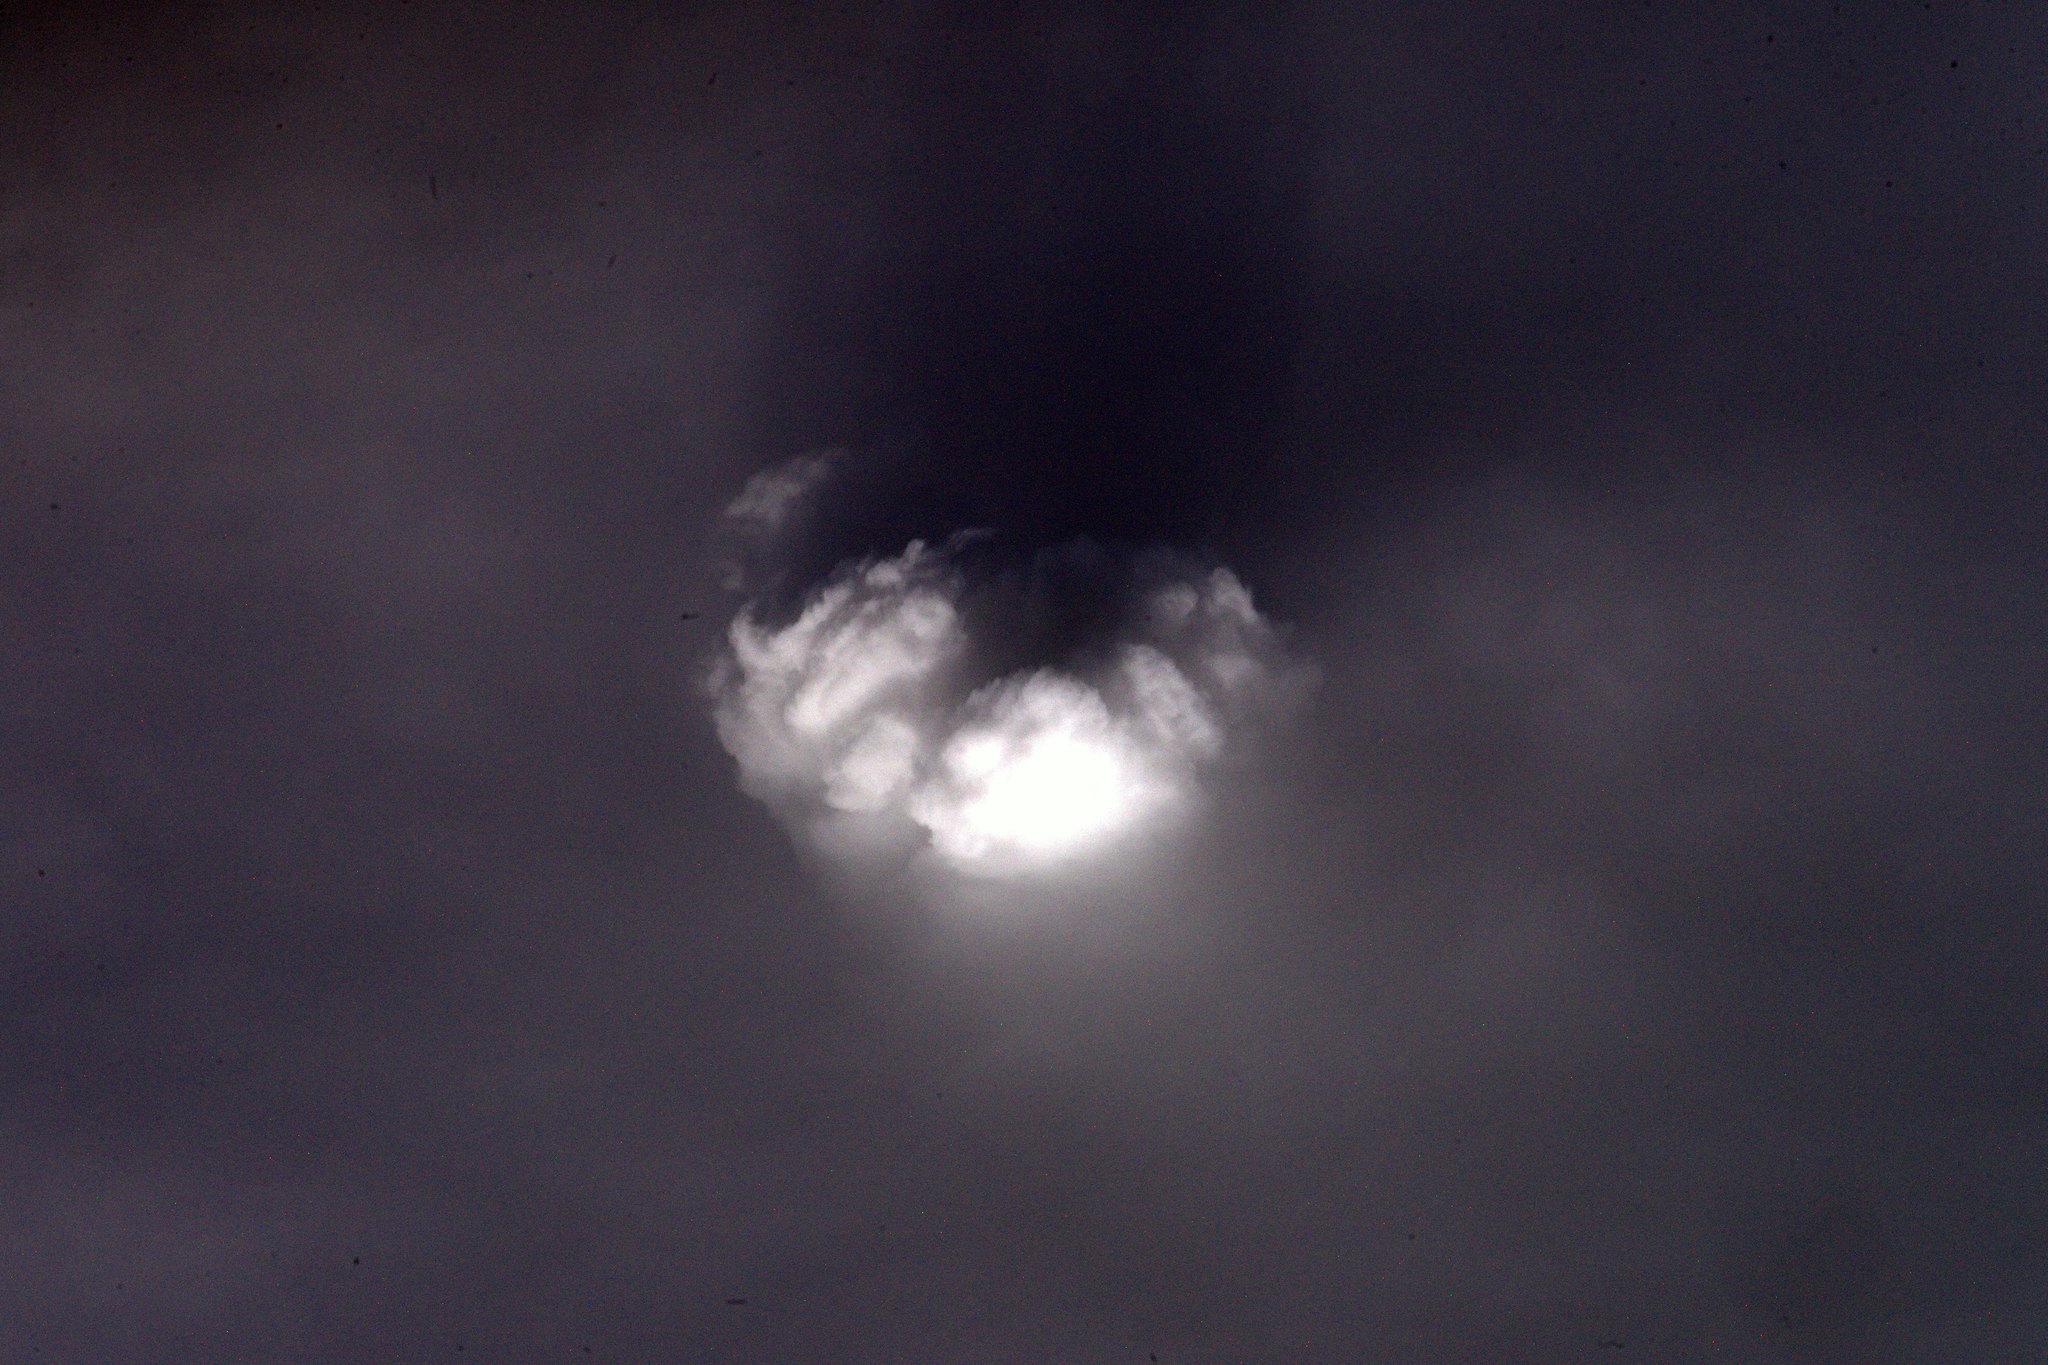 French Astronaut Thomas Pesquet - Cumulonimbus Clouds